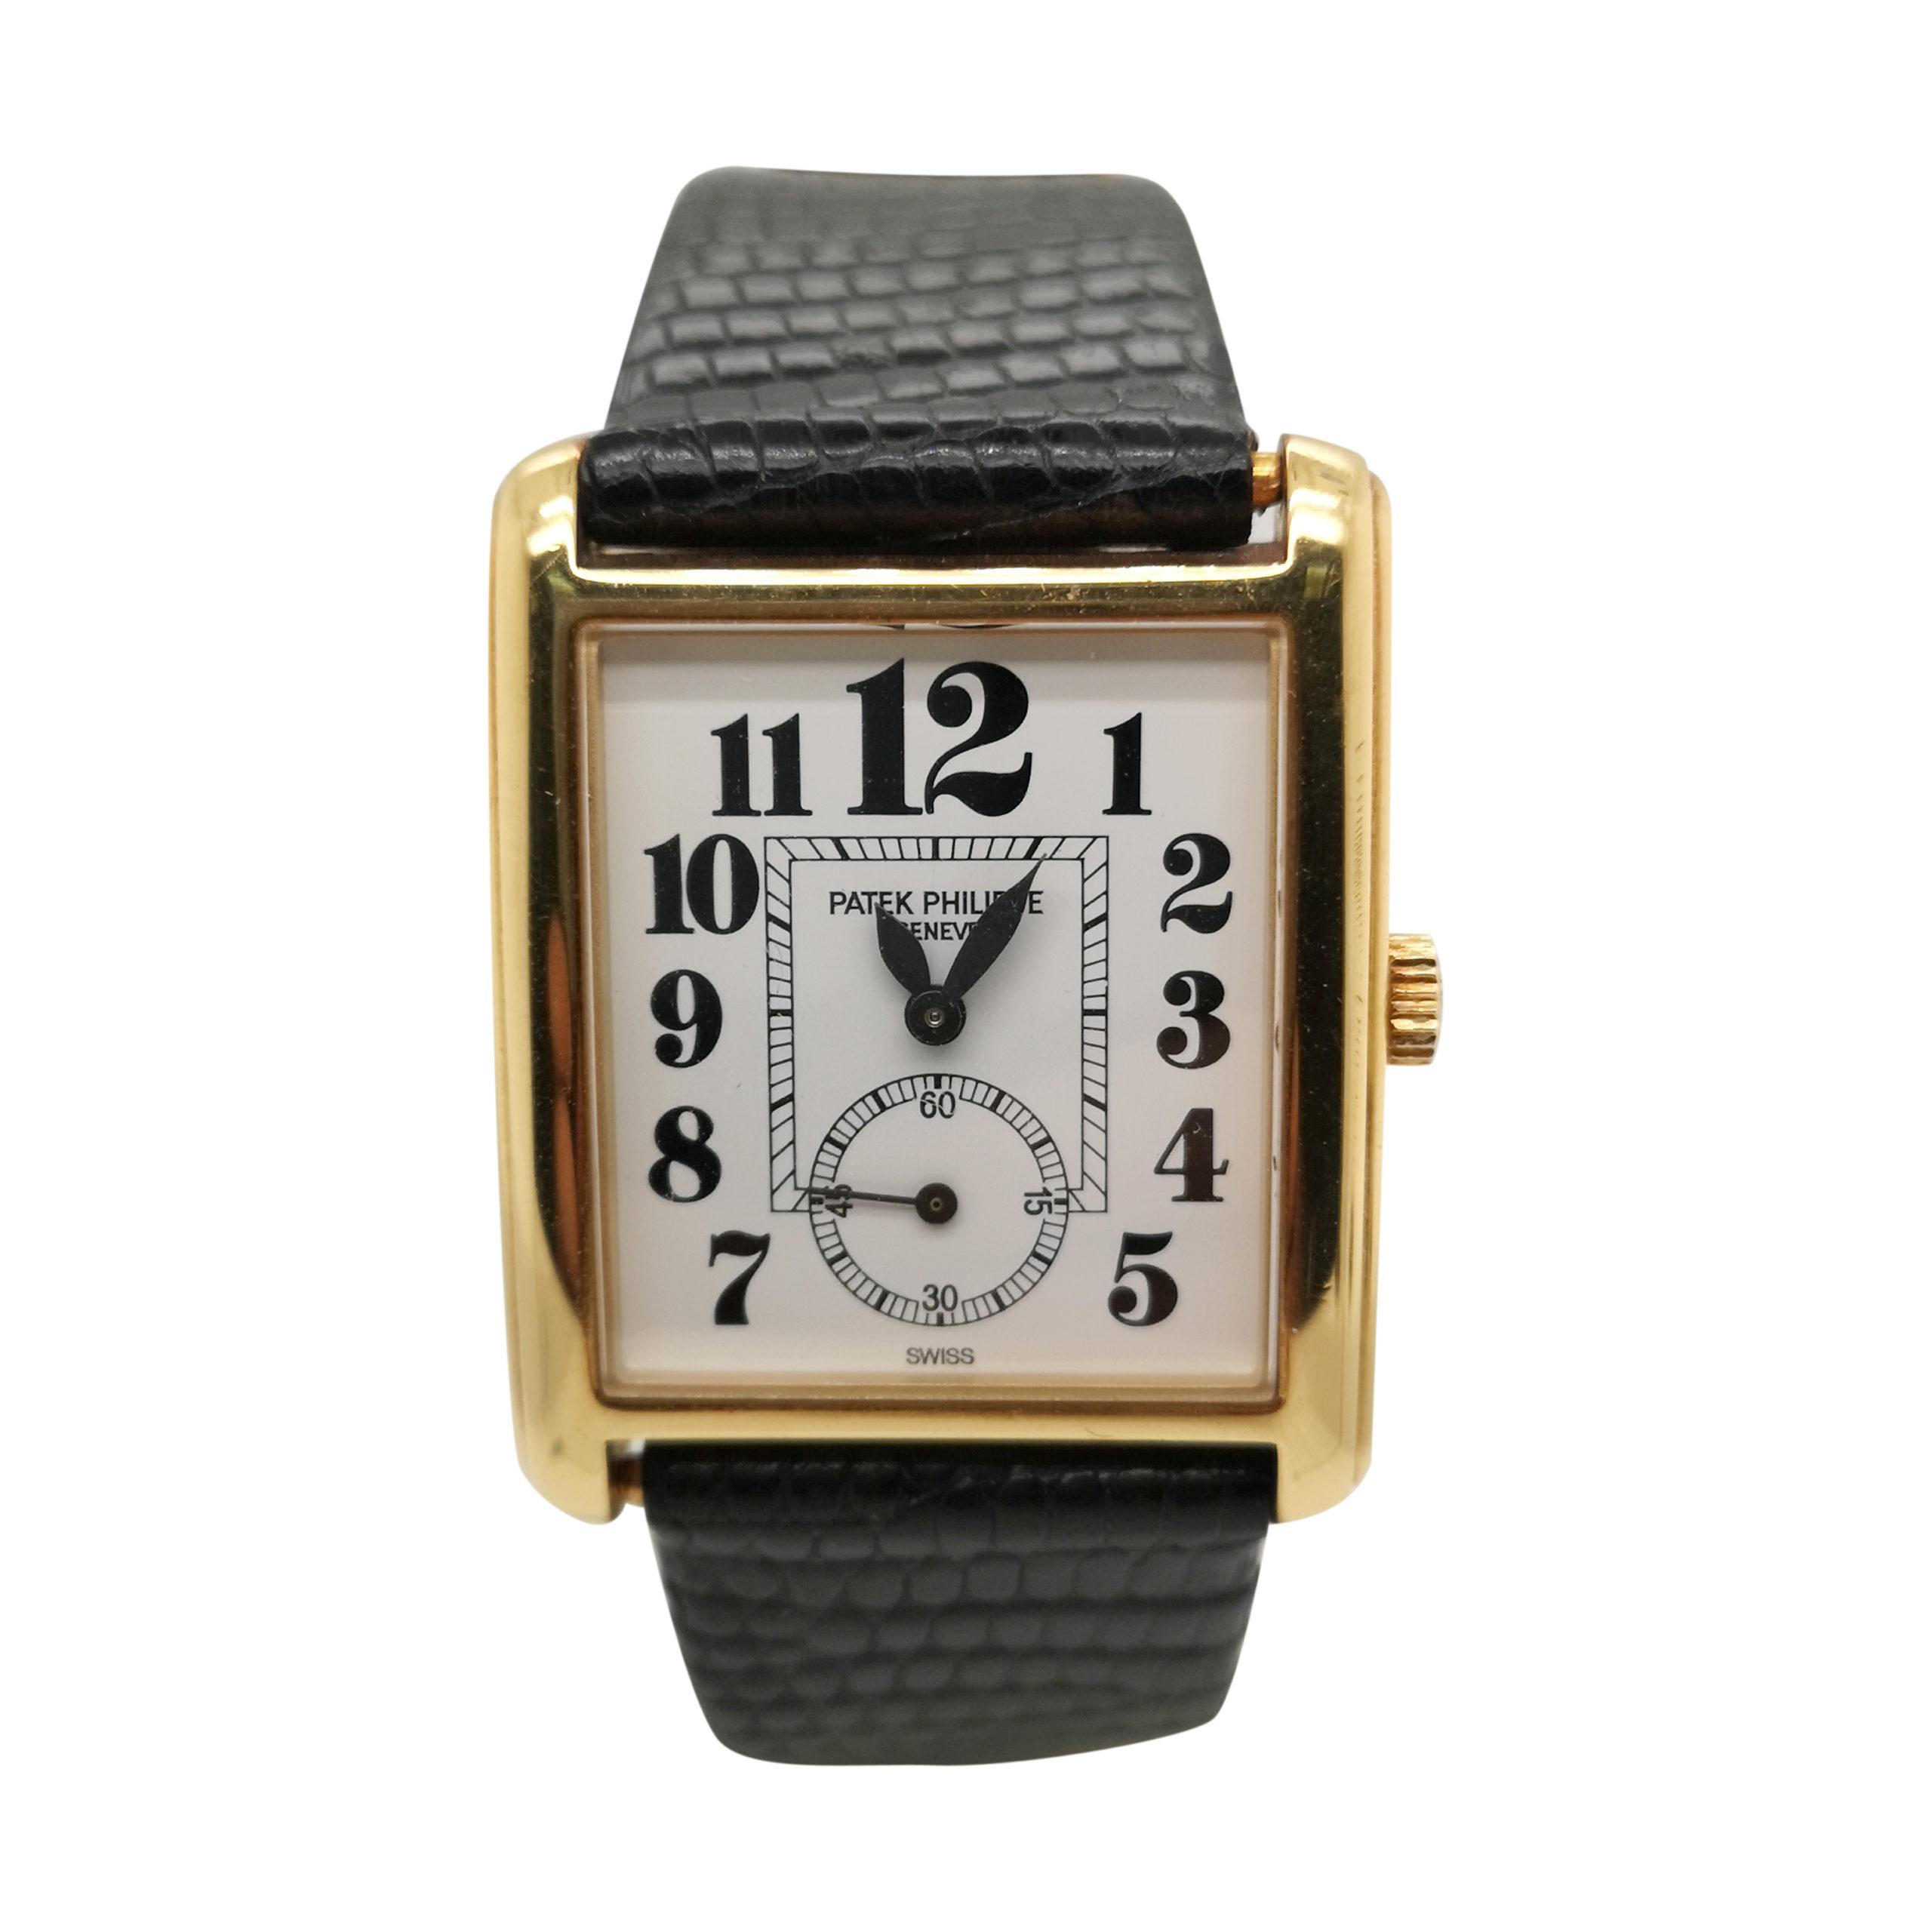 Patek Philippe Gondolo 5014 Watch